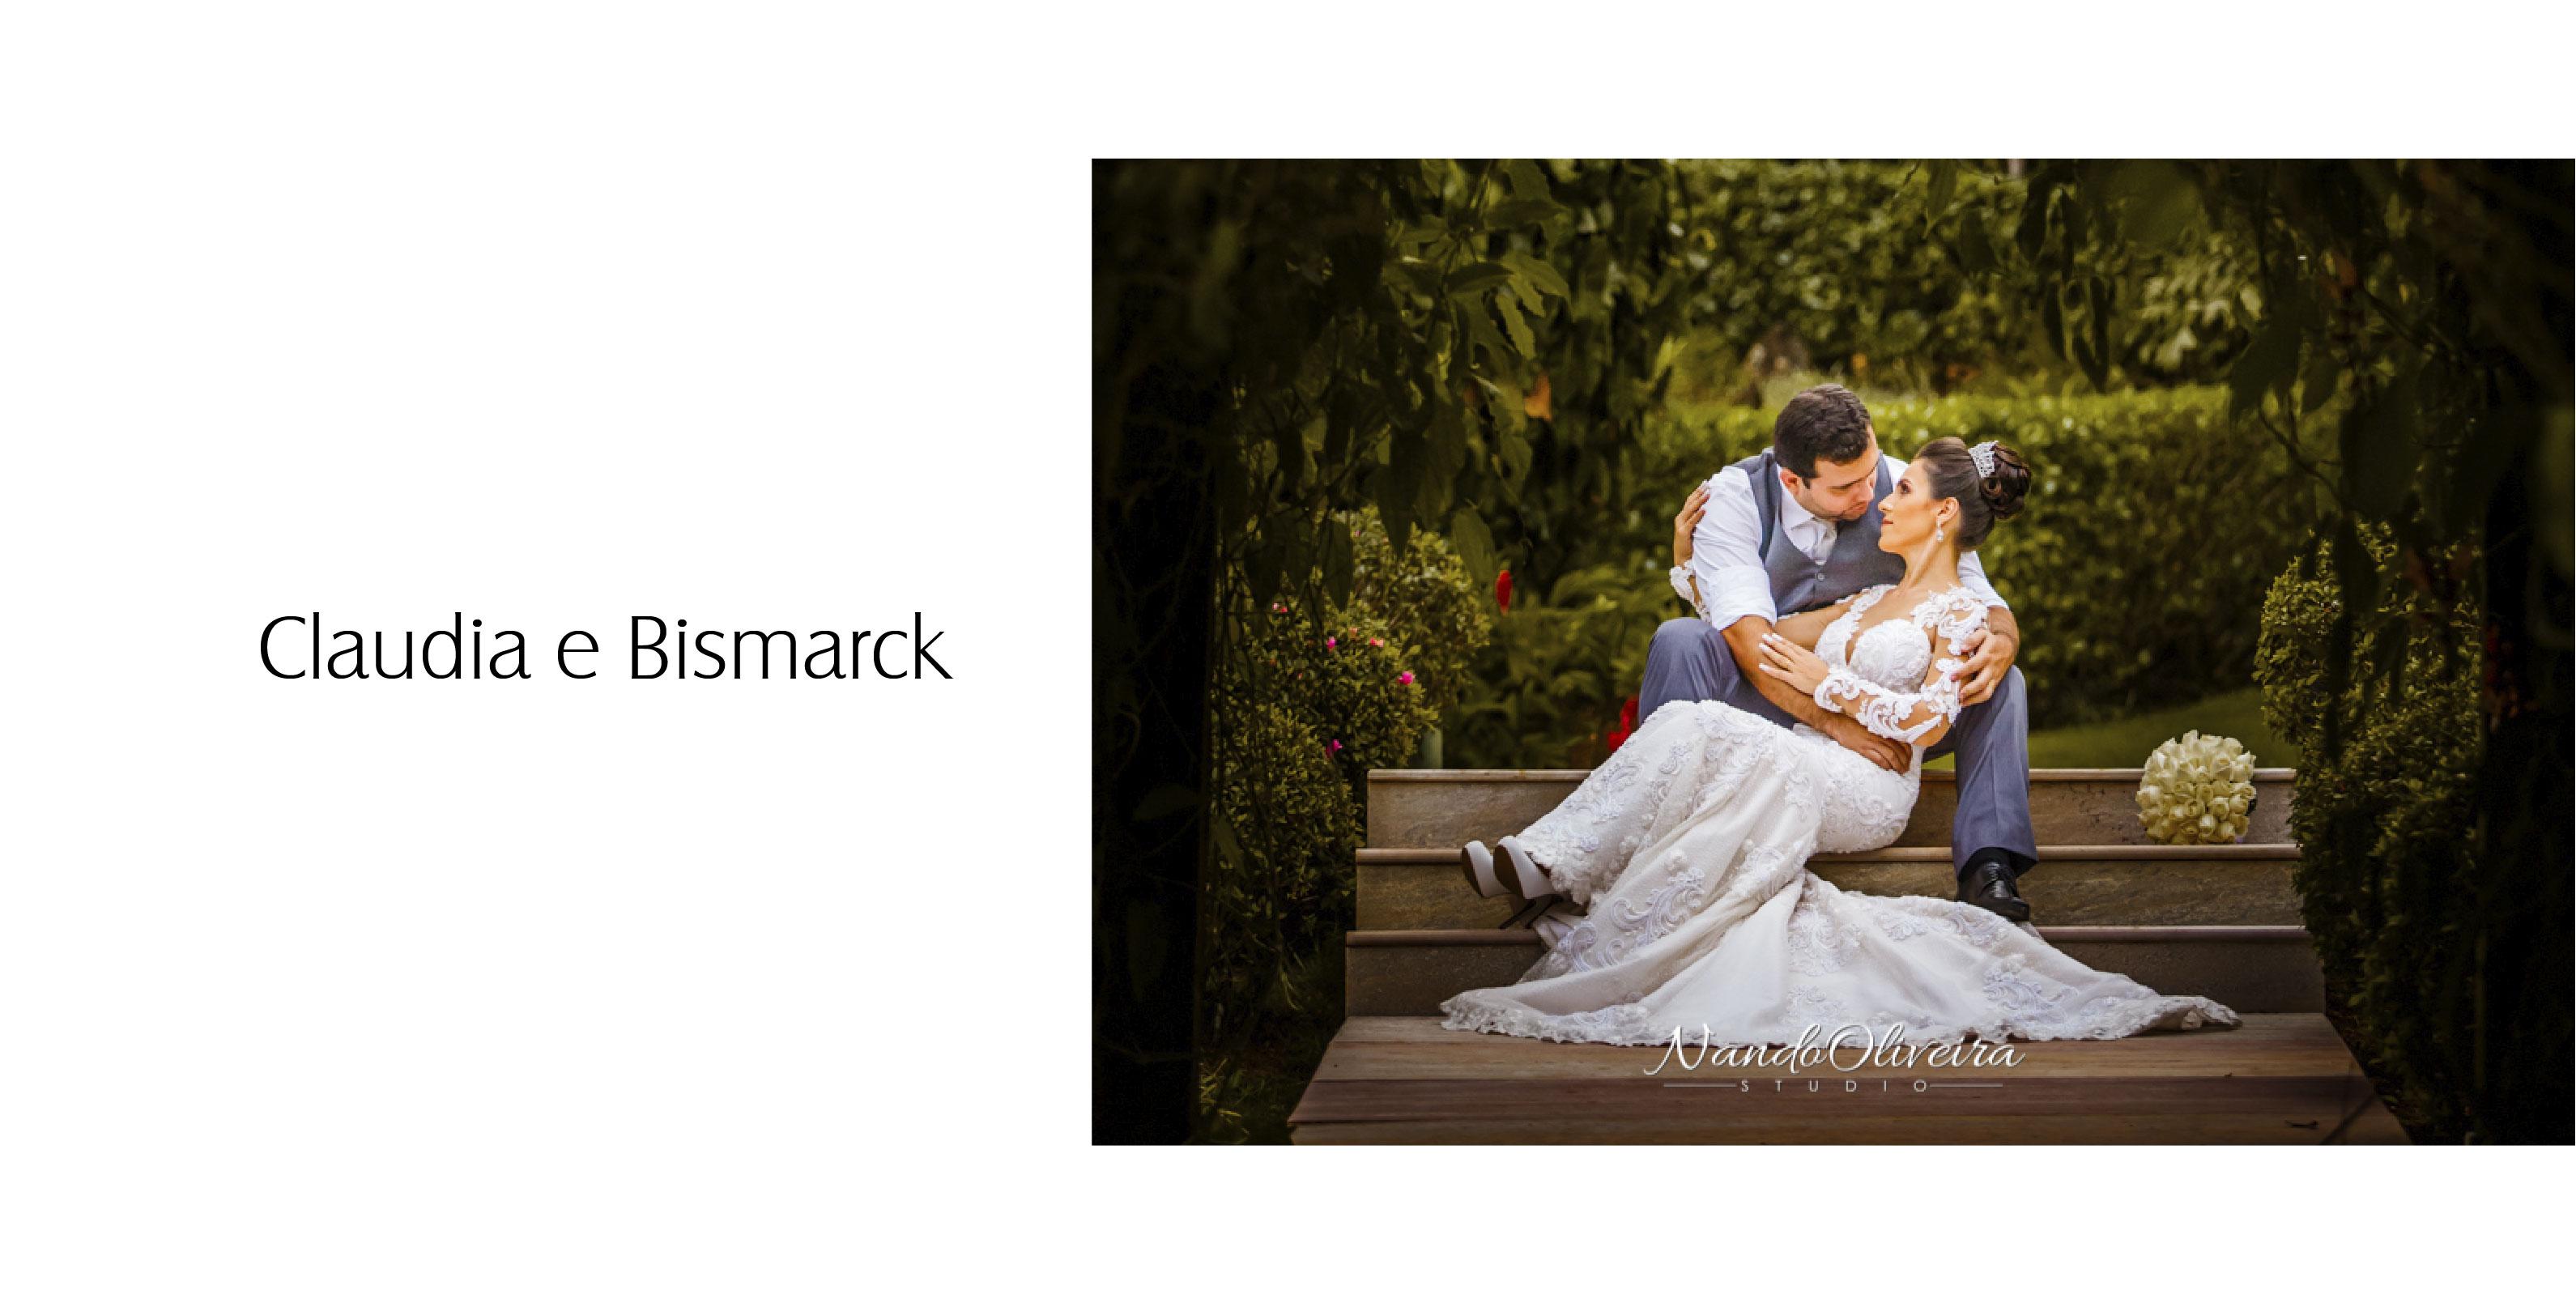 claudia e bismarck foto nando oliveira